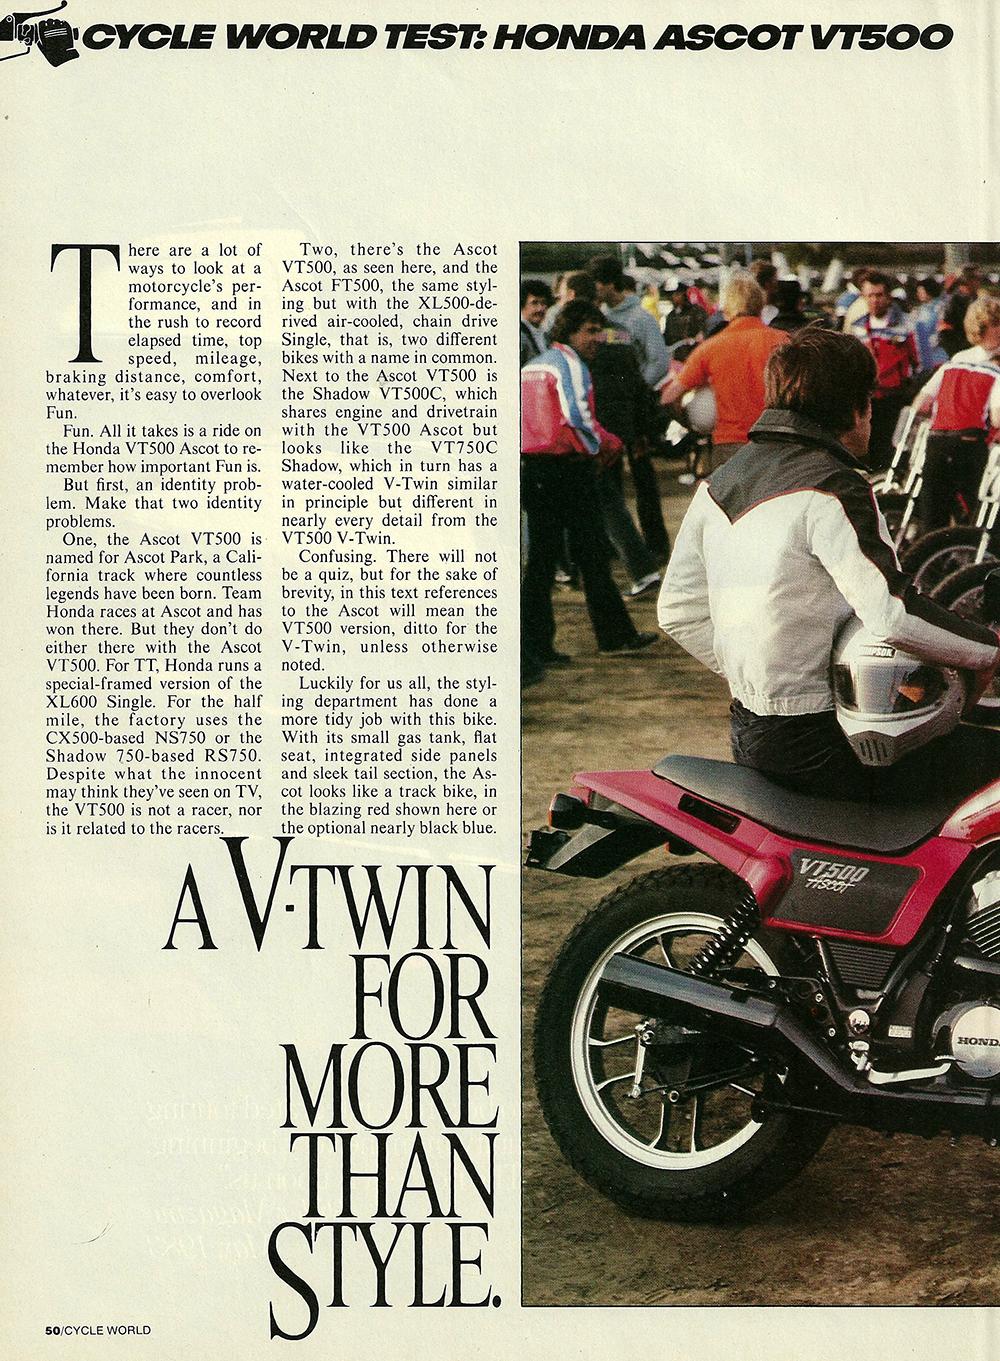 1983 Honda VT500 Ascot road test 2 01.JPG